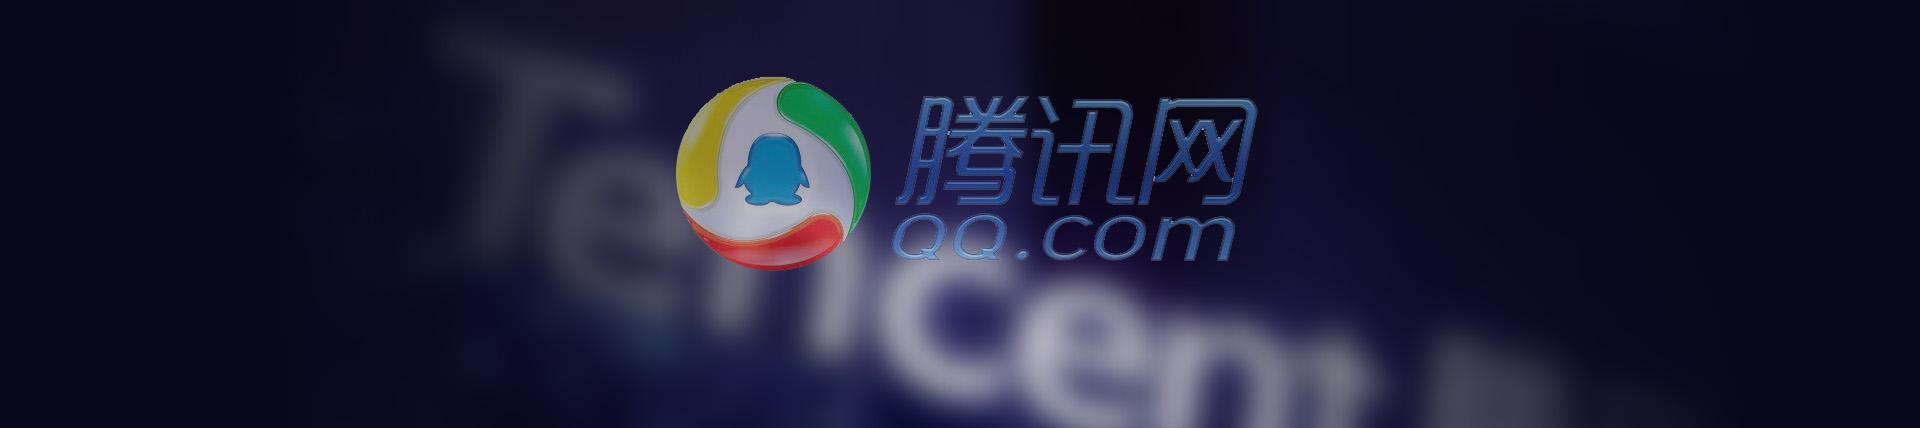 QQ.com真实收购价曝光!成就腾讯帝国的除了马化腾还有他